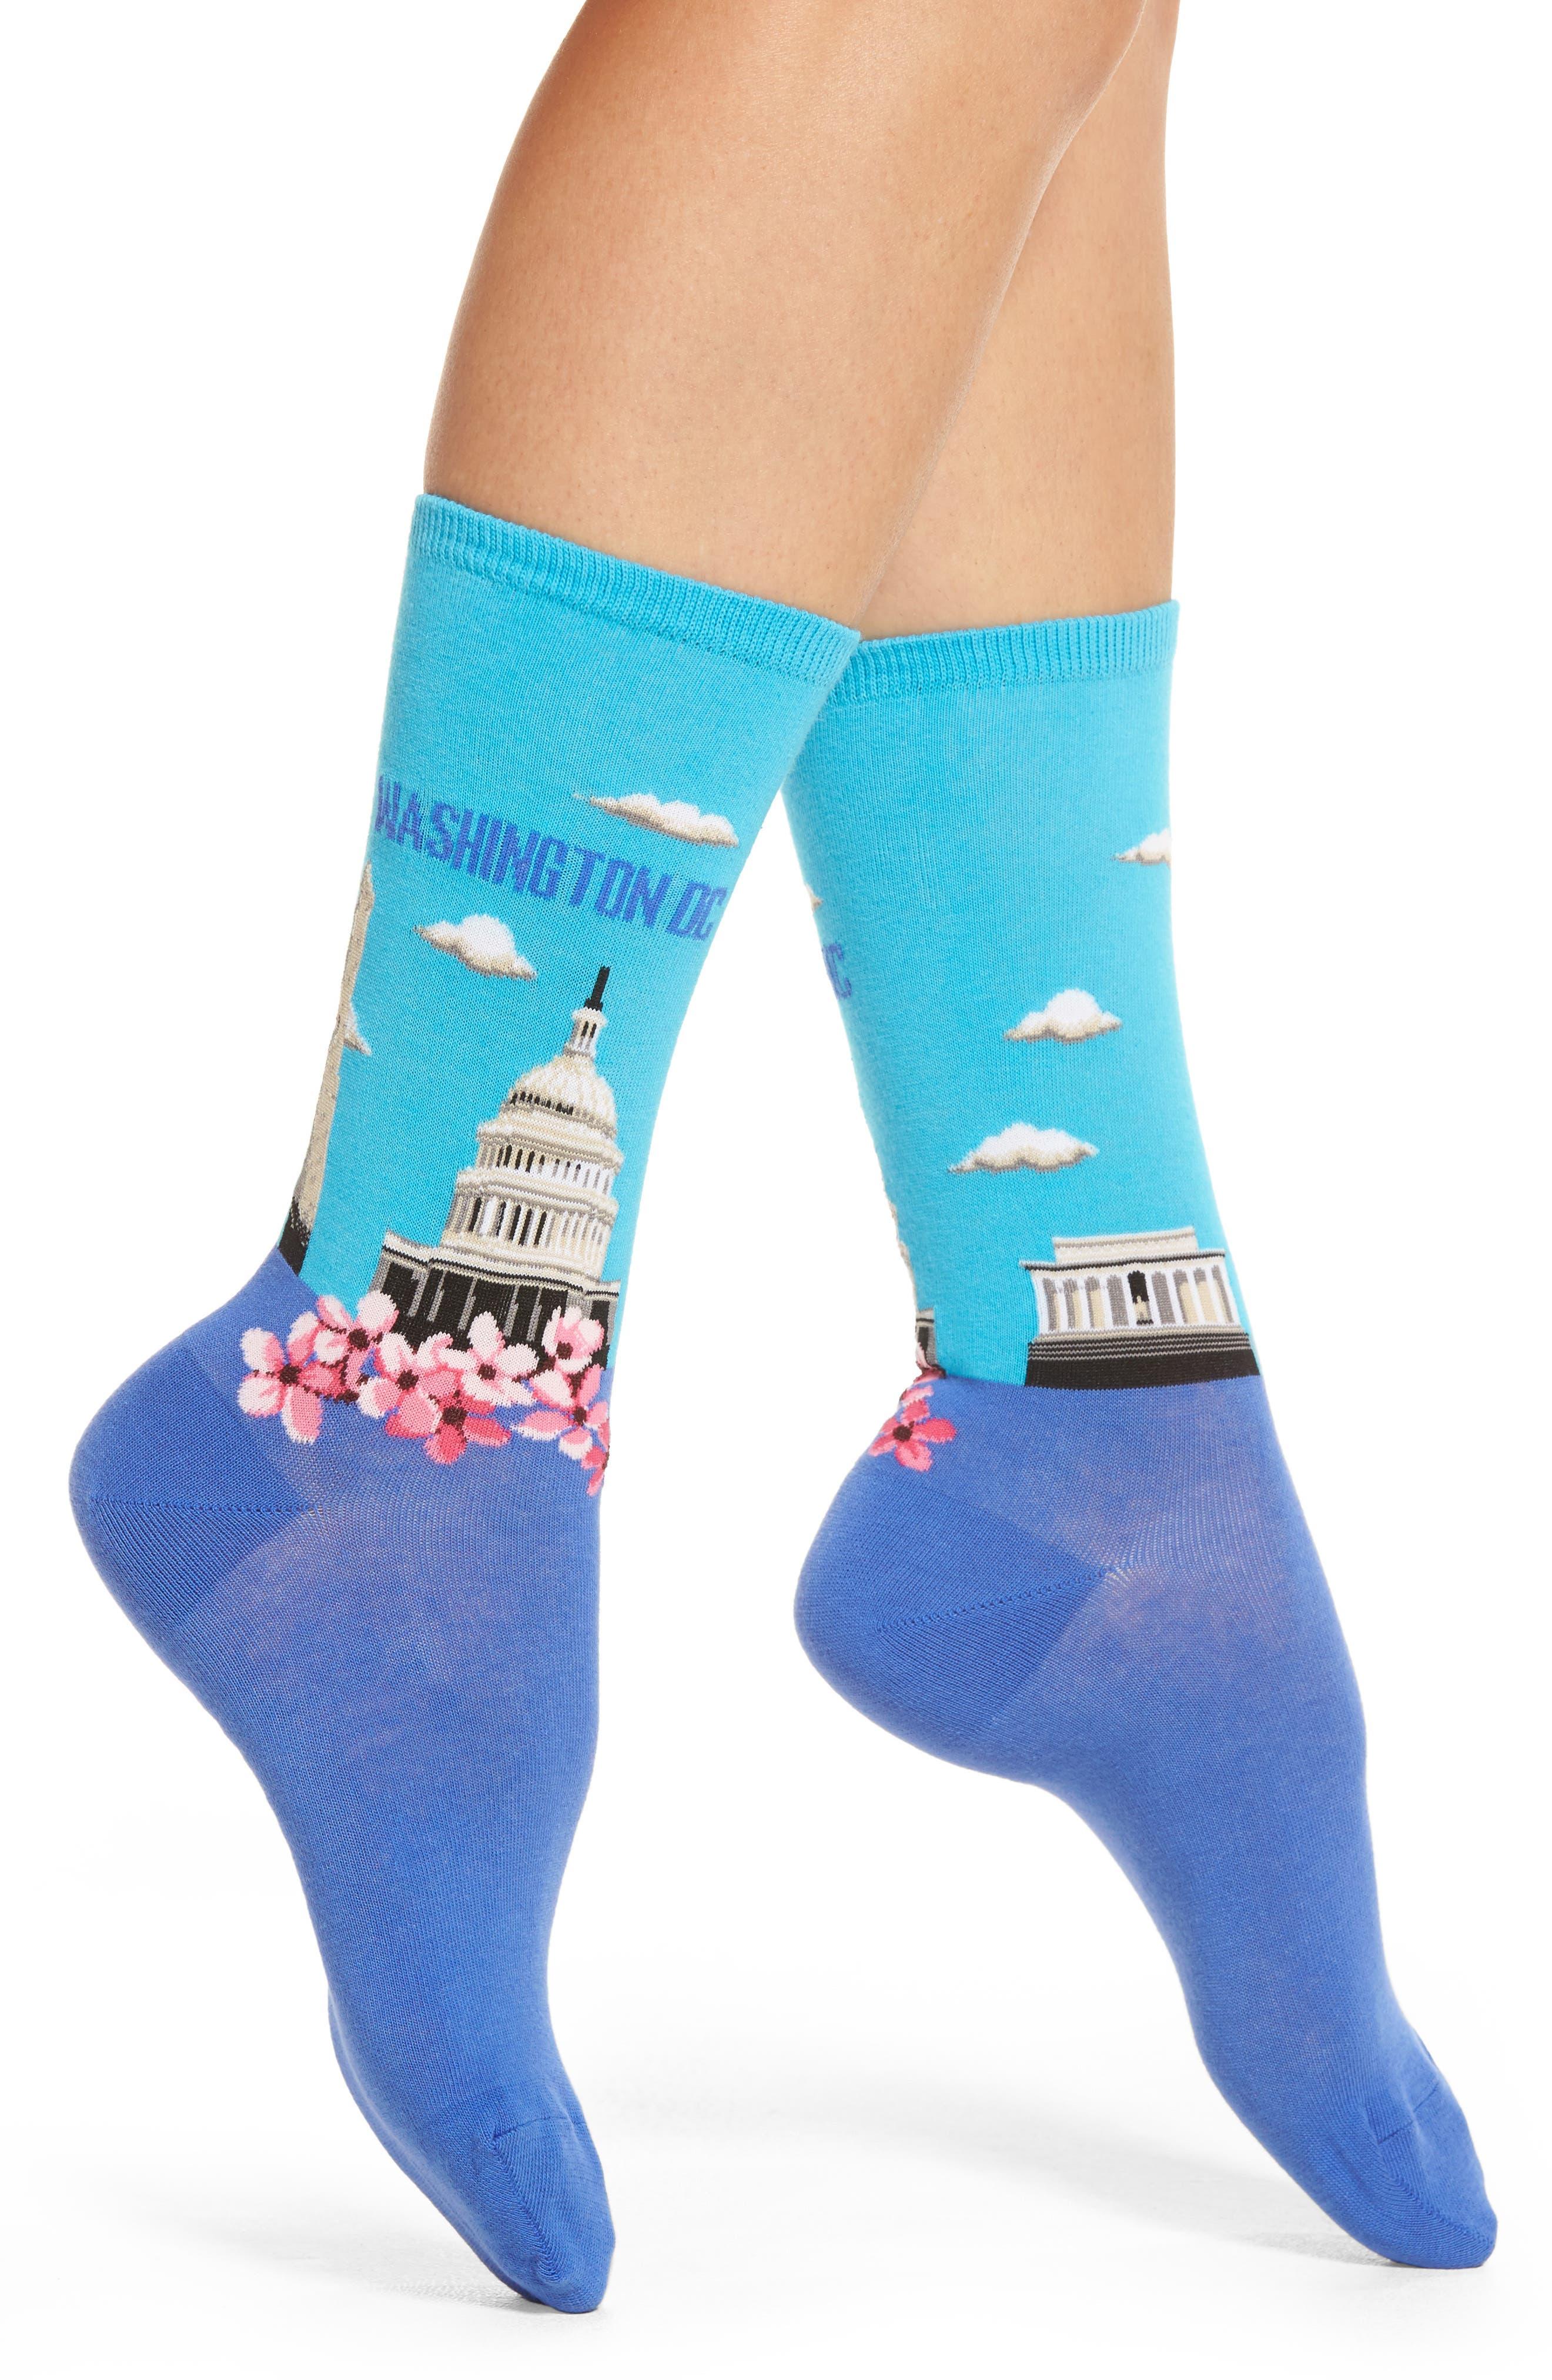 Alternate Image 1 Selected - Hot Sox Washington DC Crew Socks (3 for $15)